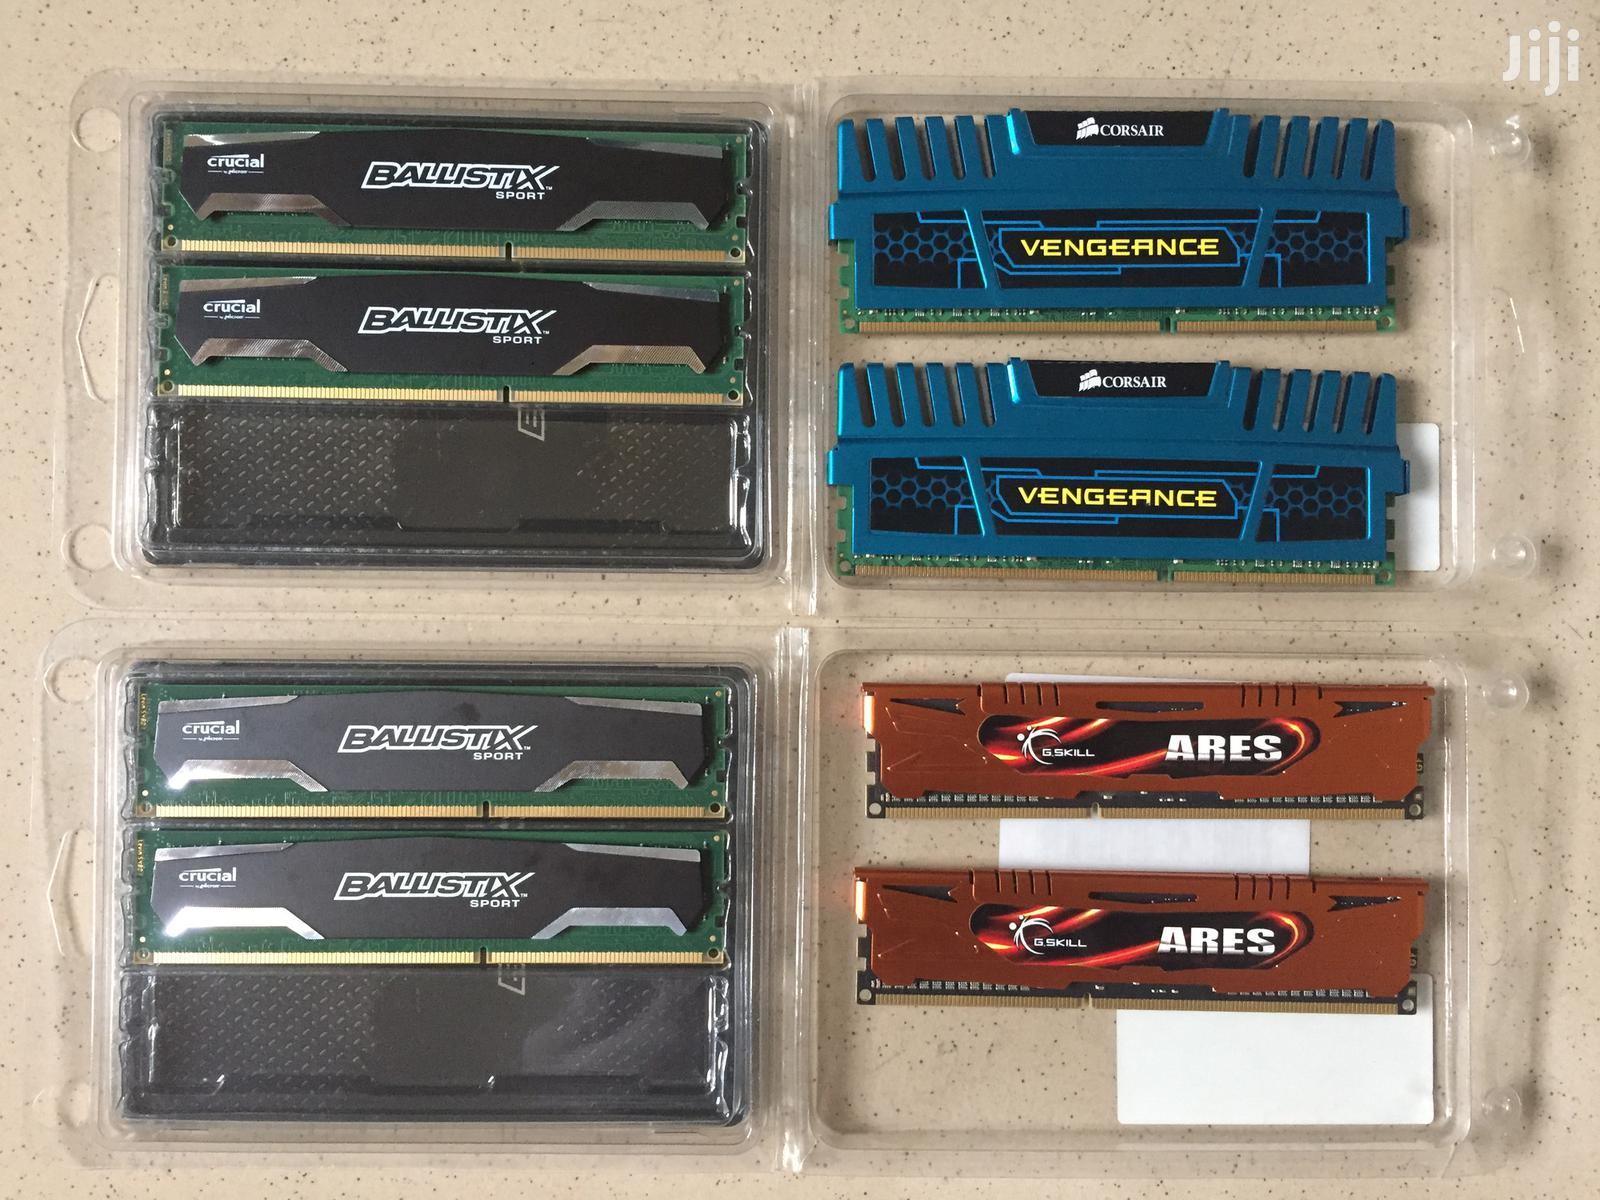 Ddr3 Desktop Ram / Memory